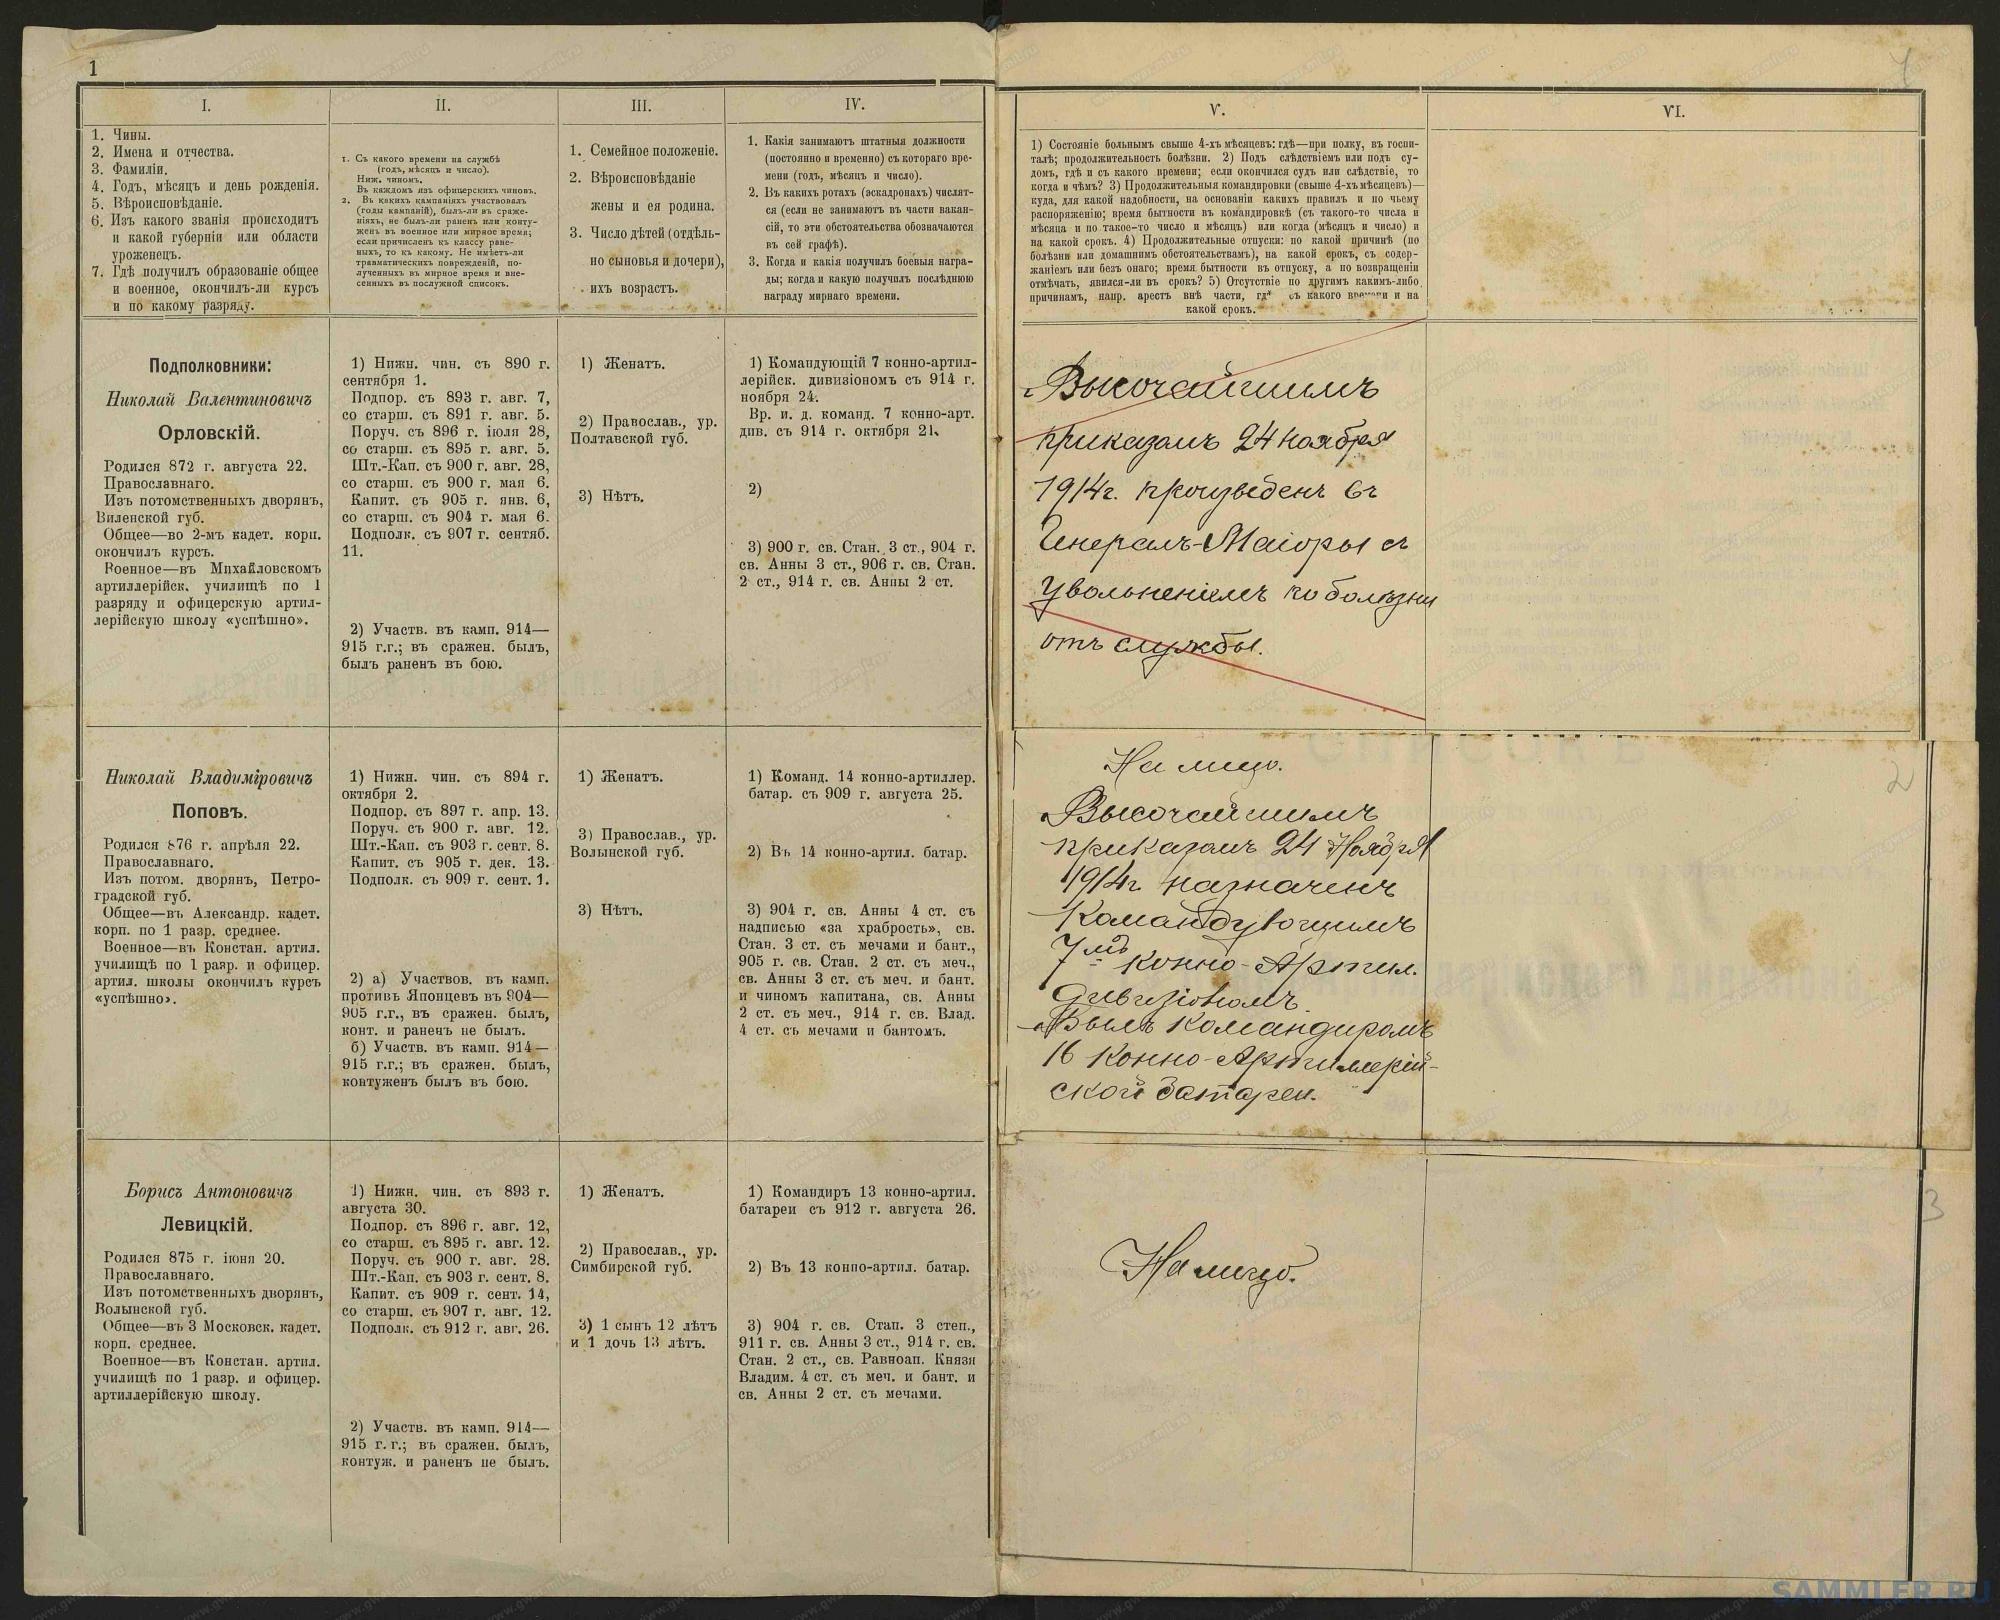 Список офицеров 7-го конно-артиллерийского дивизиона на 01.01.1915__02_.jpg